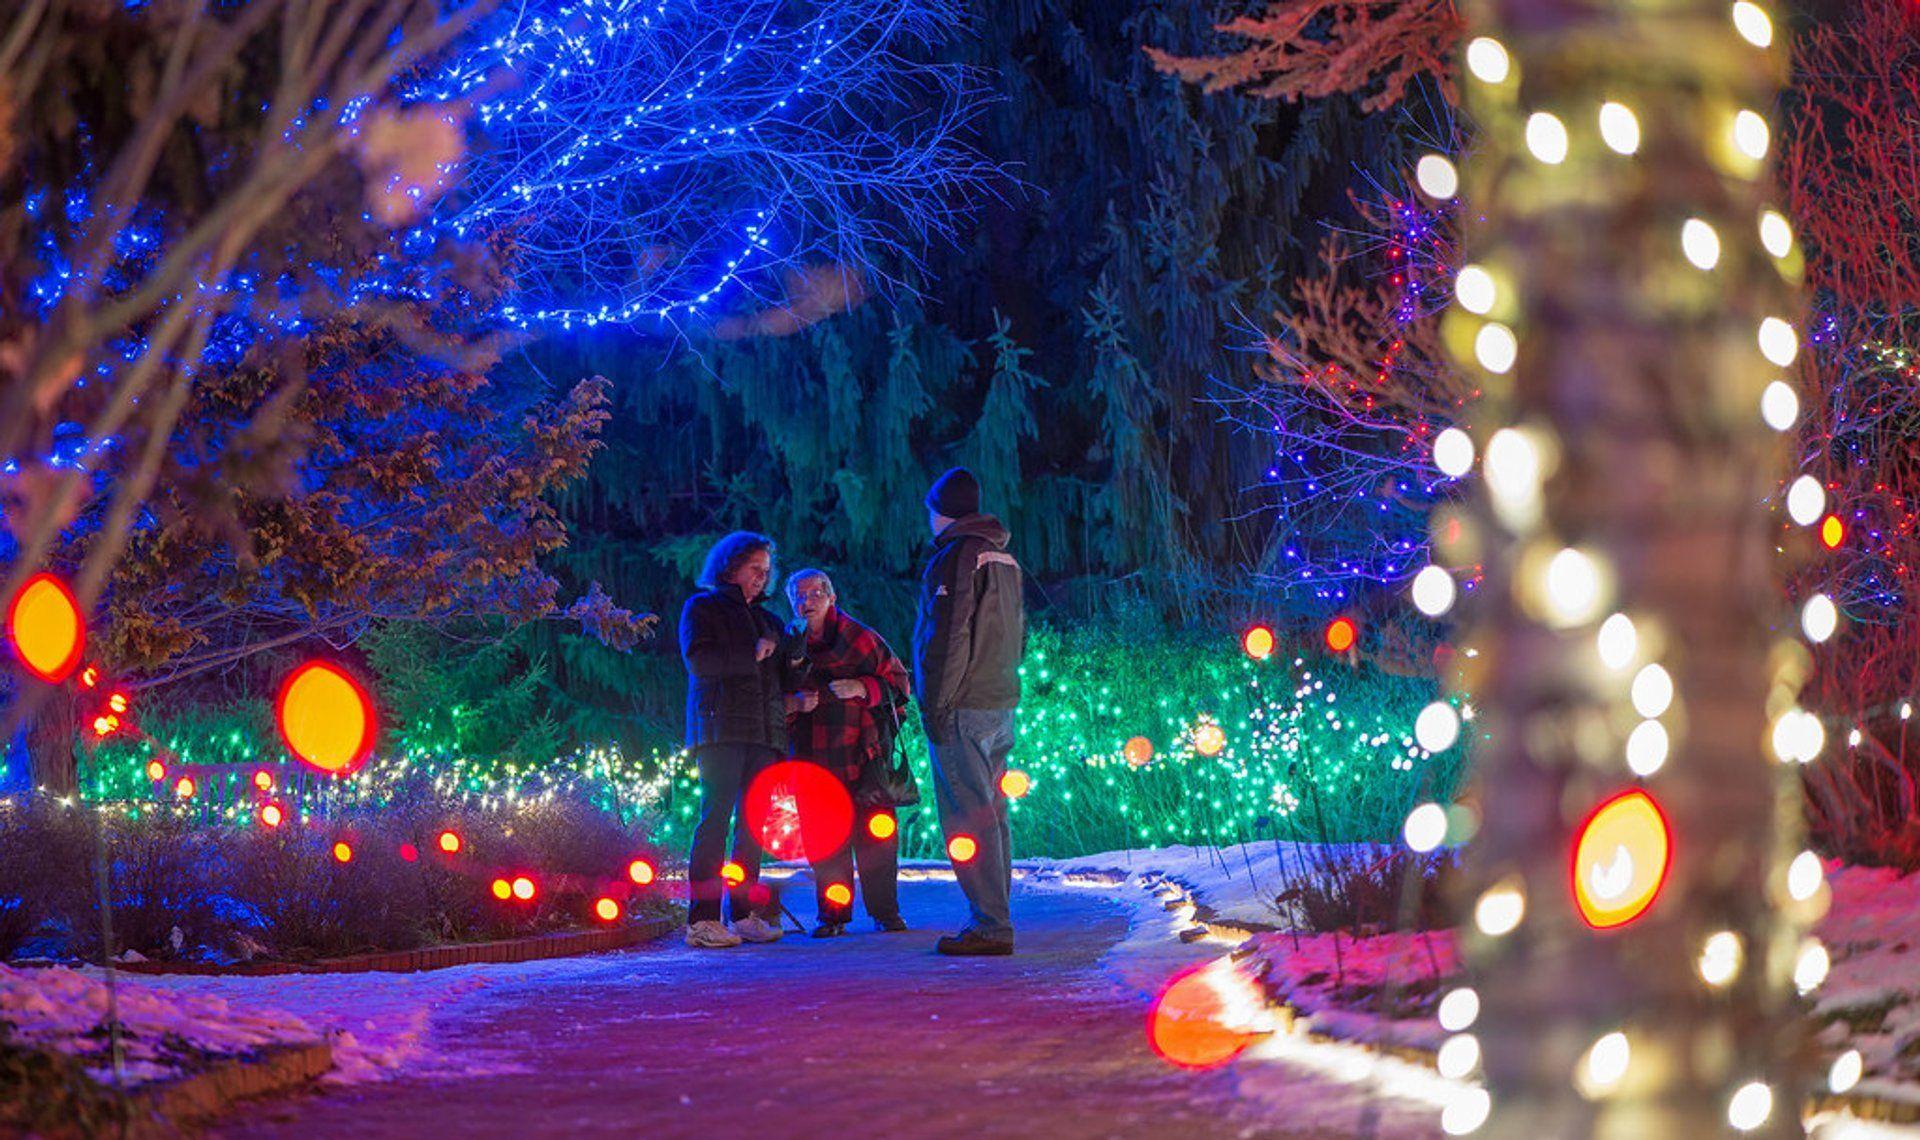 94acf2bcf5dcf59a9079497b5fb989ac - Botanical Gardens Boylston Ma Christmas Lights